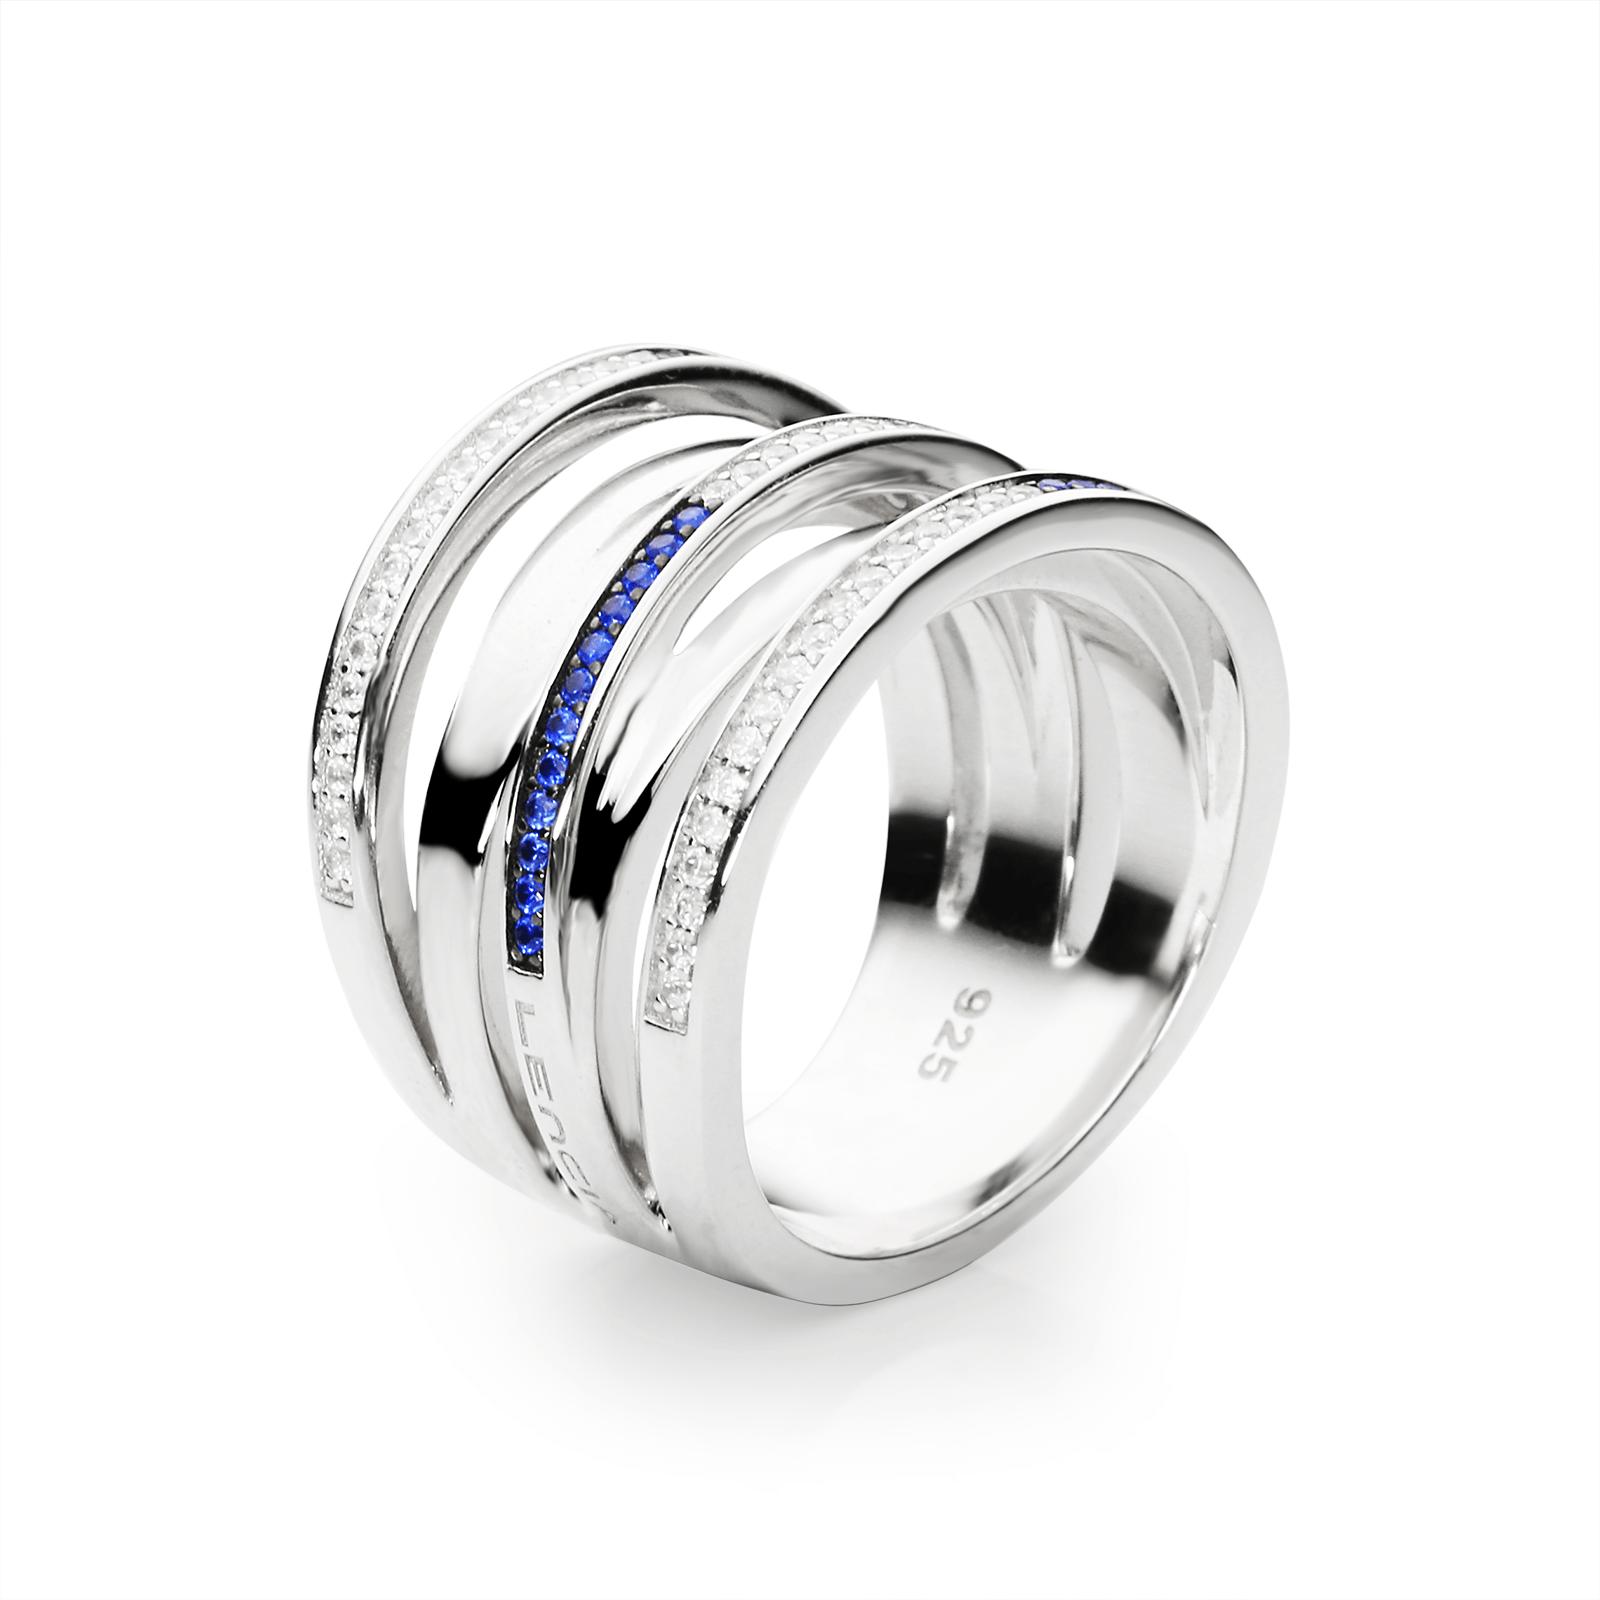 CZ 1 mm - 28 x; blue spinel 1 mm - 51 x